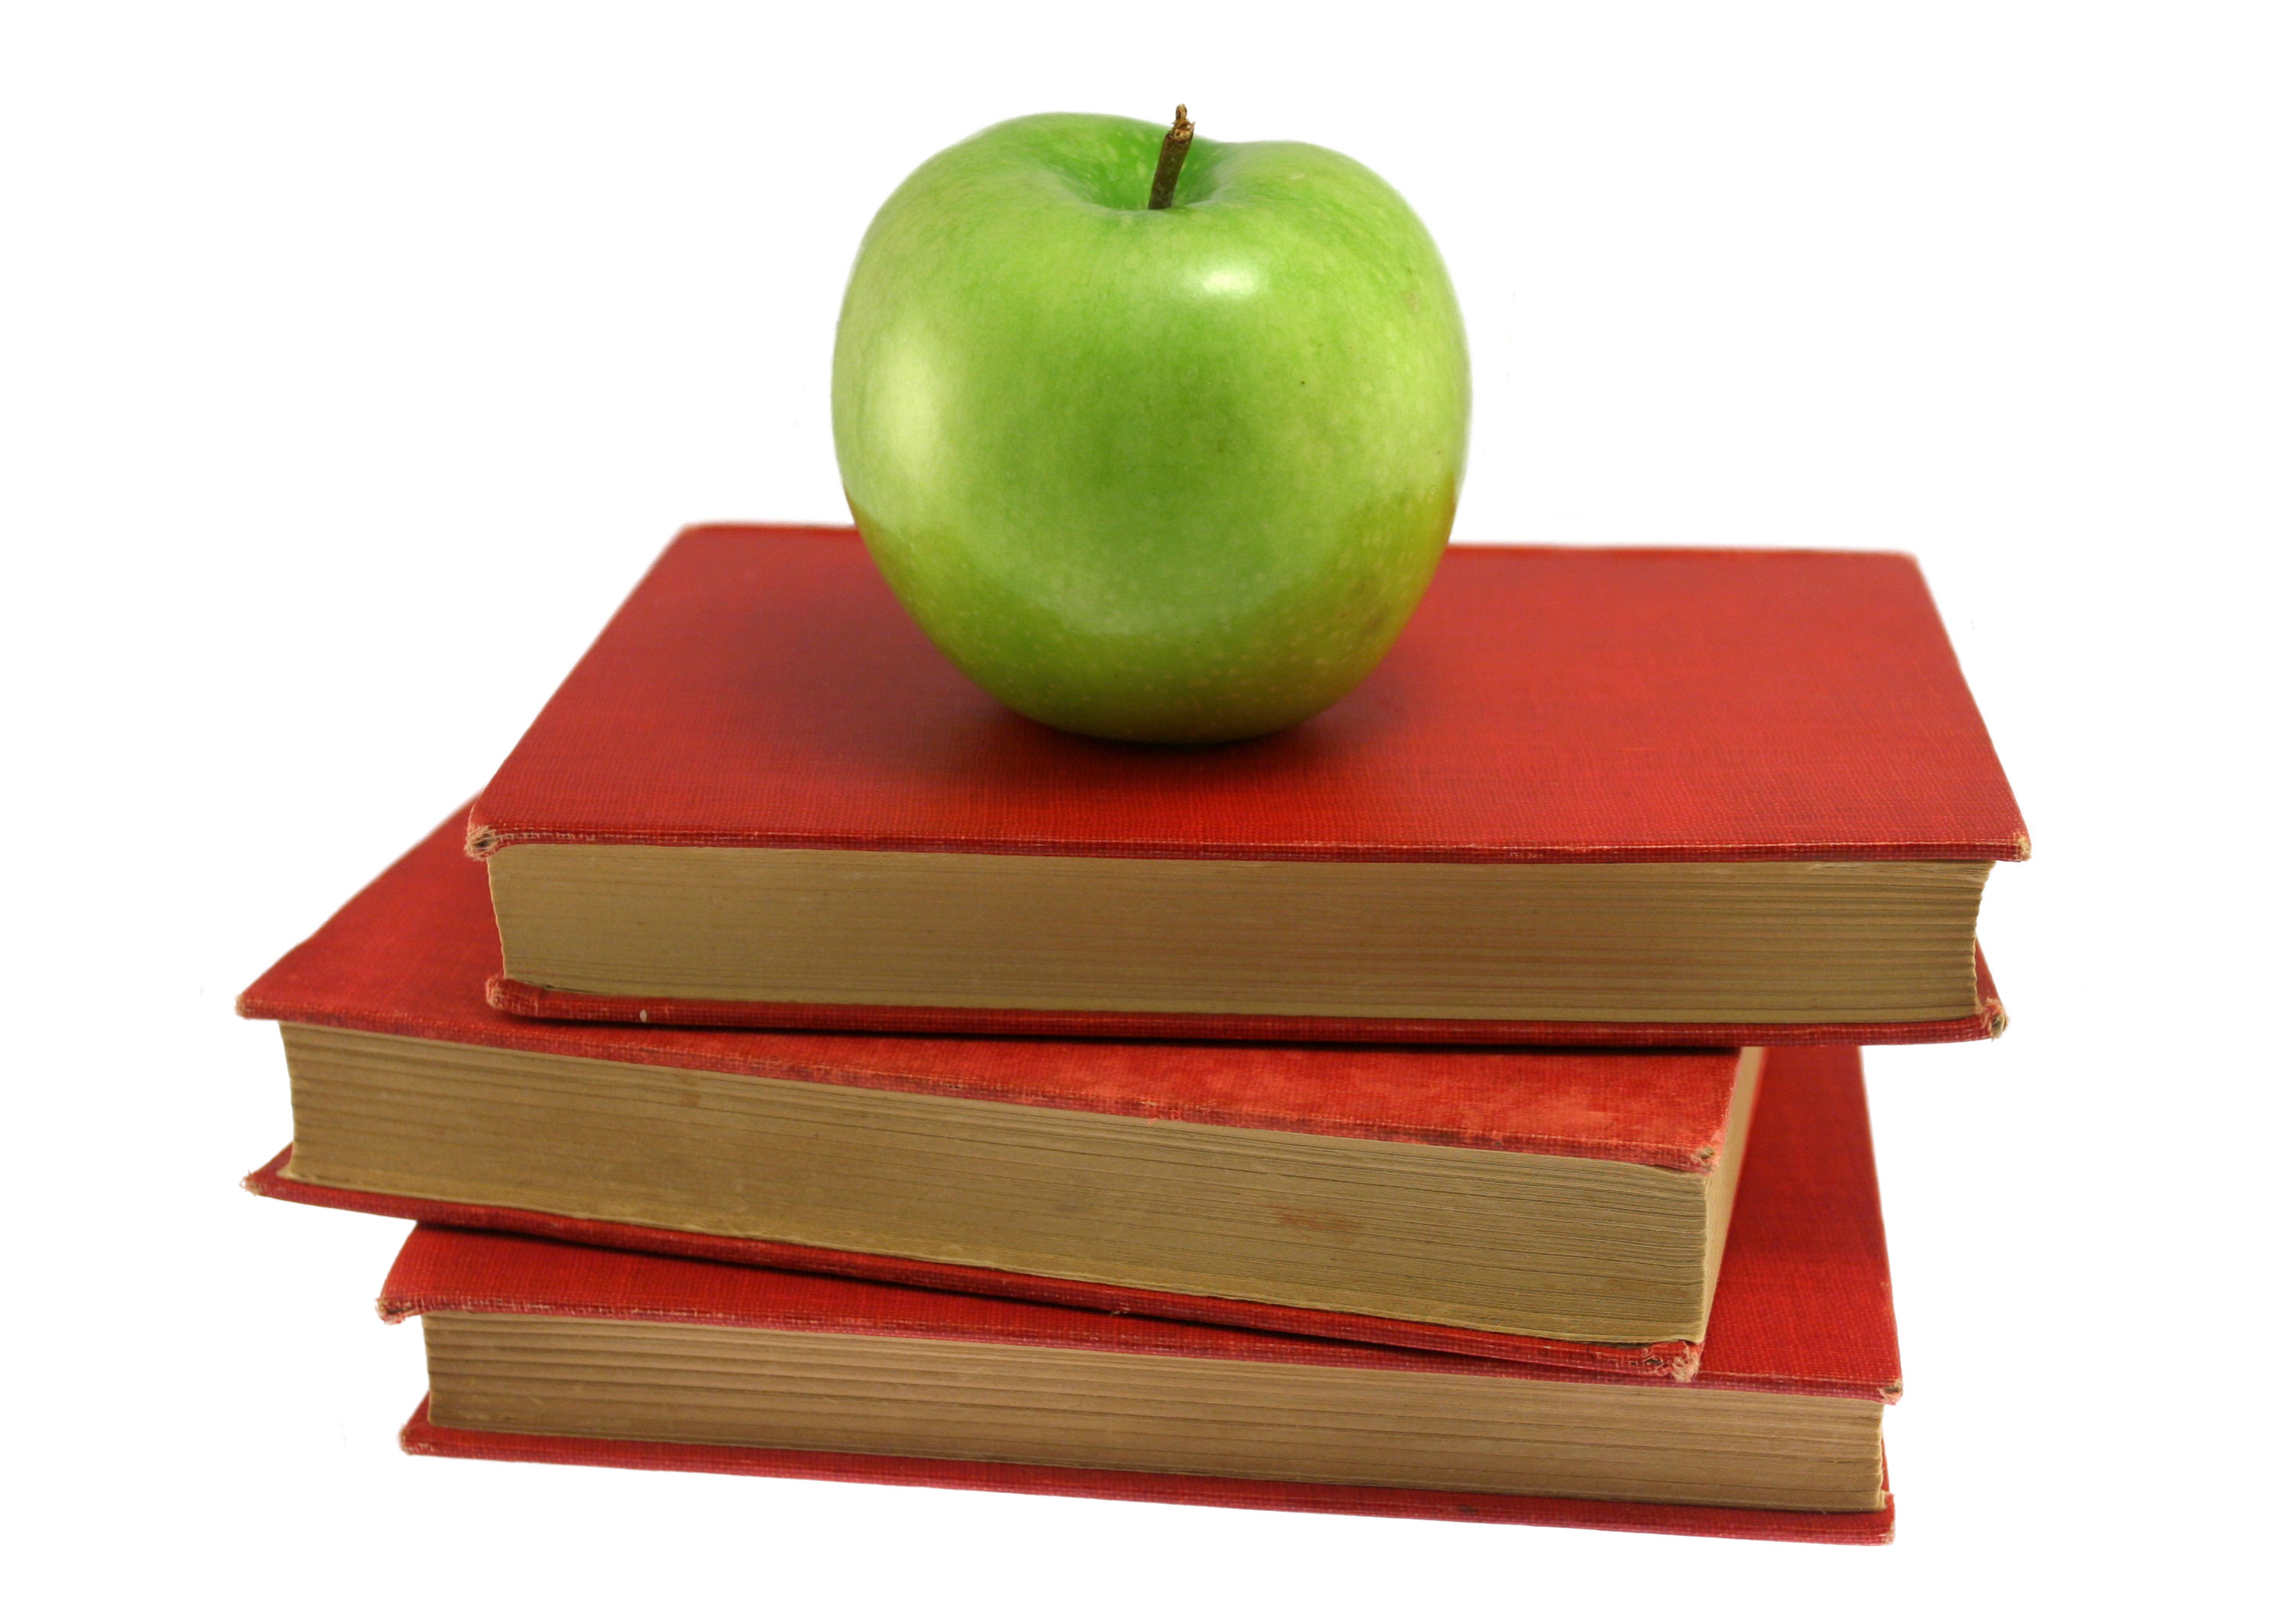 Green Apple on Books : The Chicago Moms